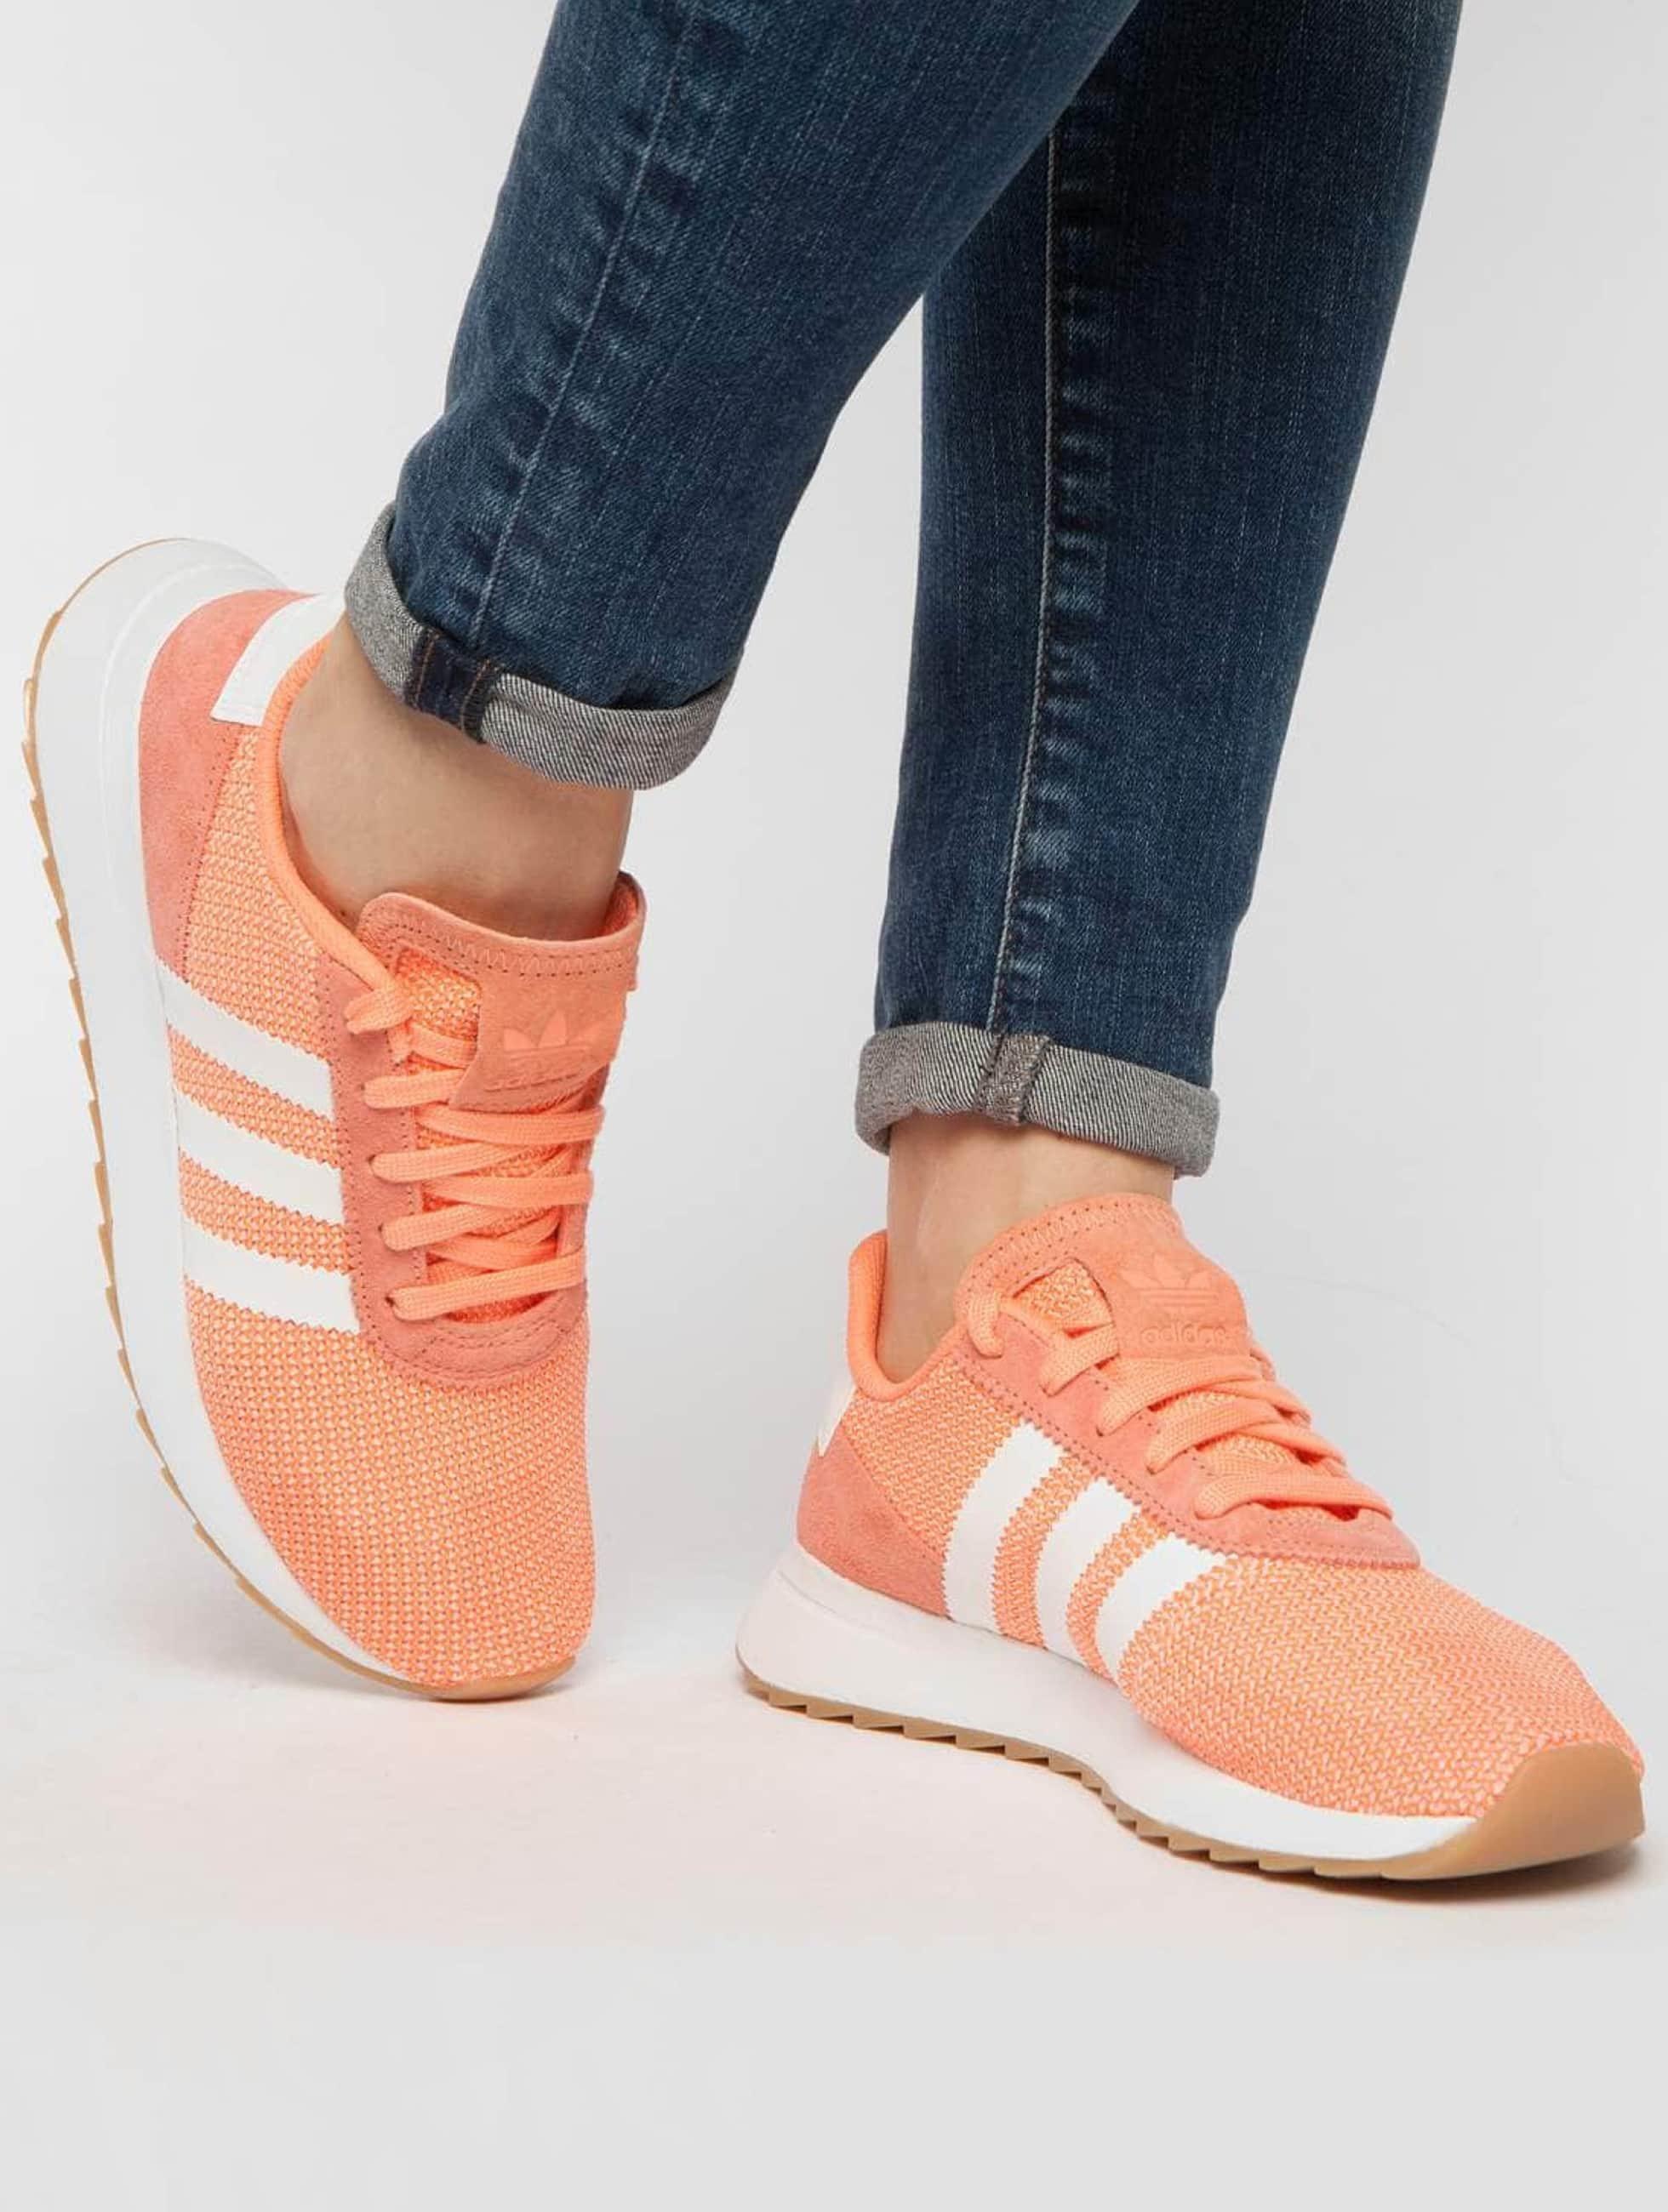 adidas originals Sneakers originals Flashback Runner pomaranczowy